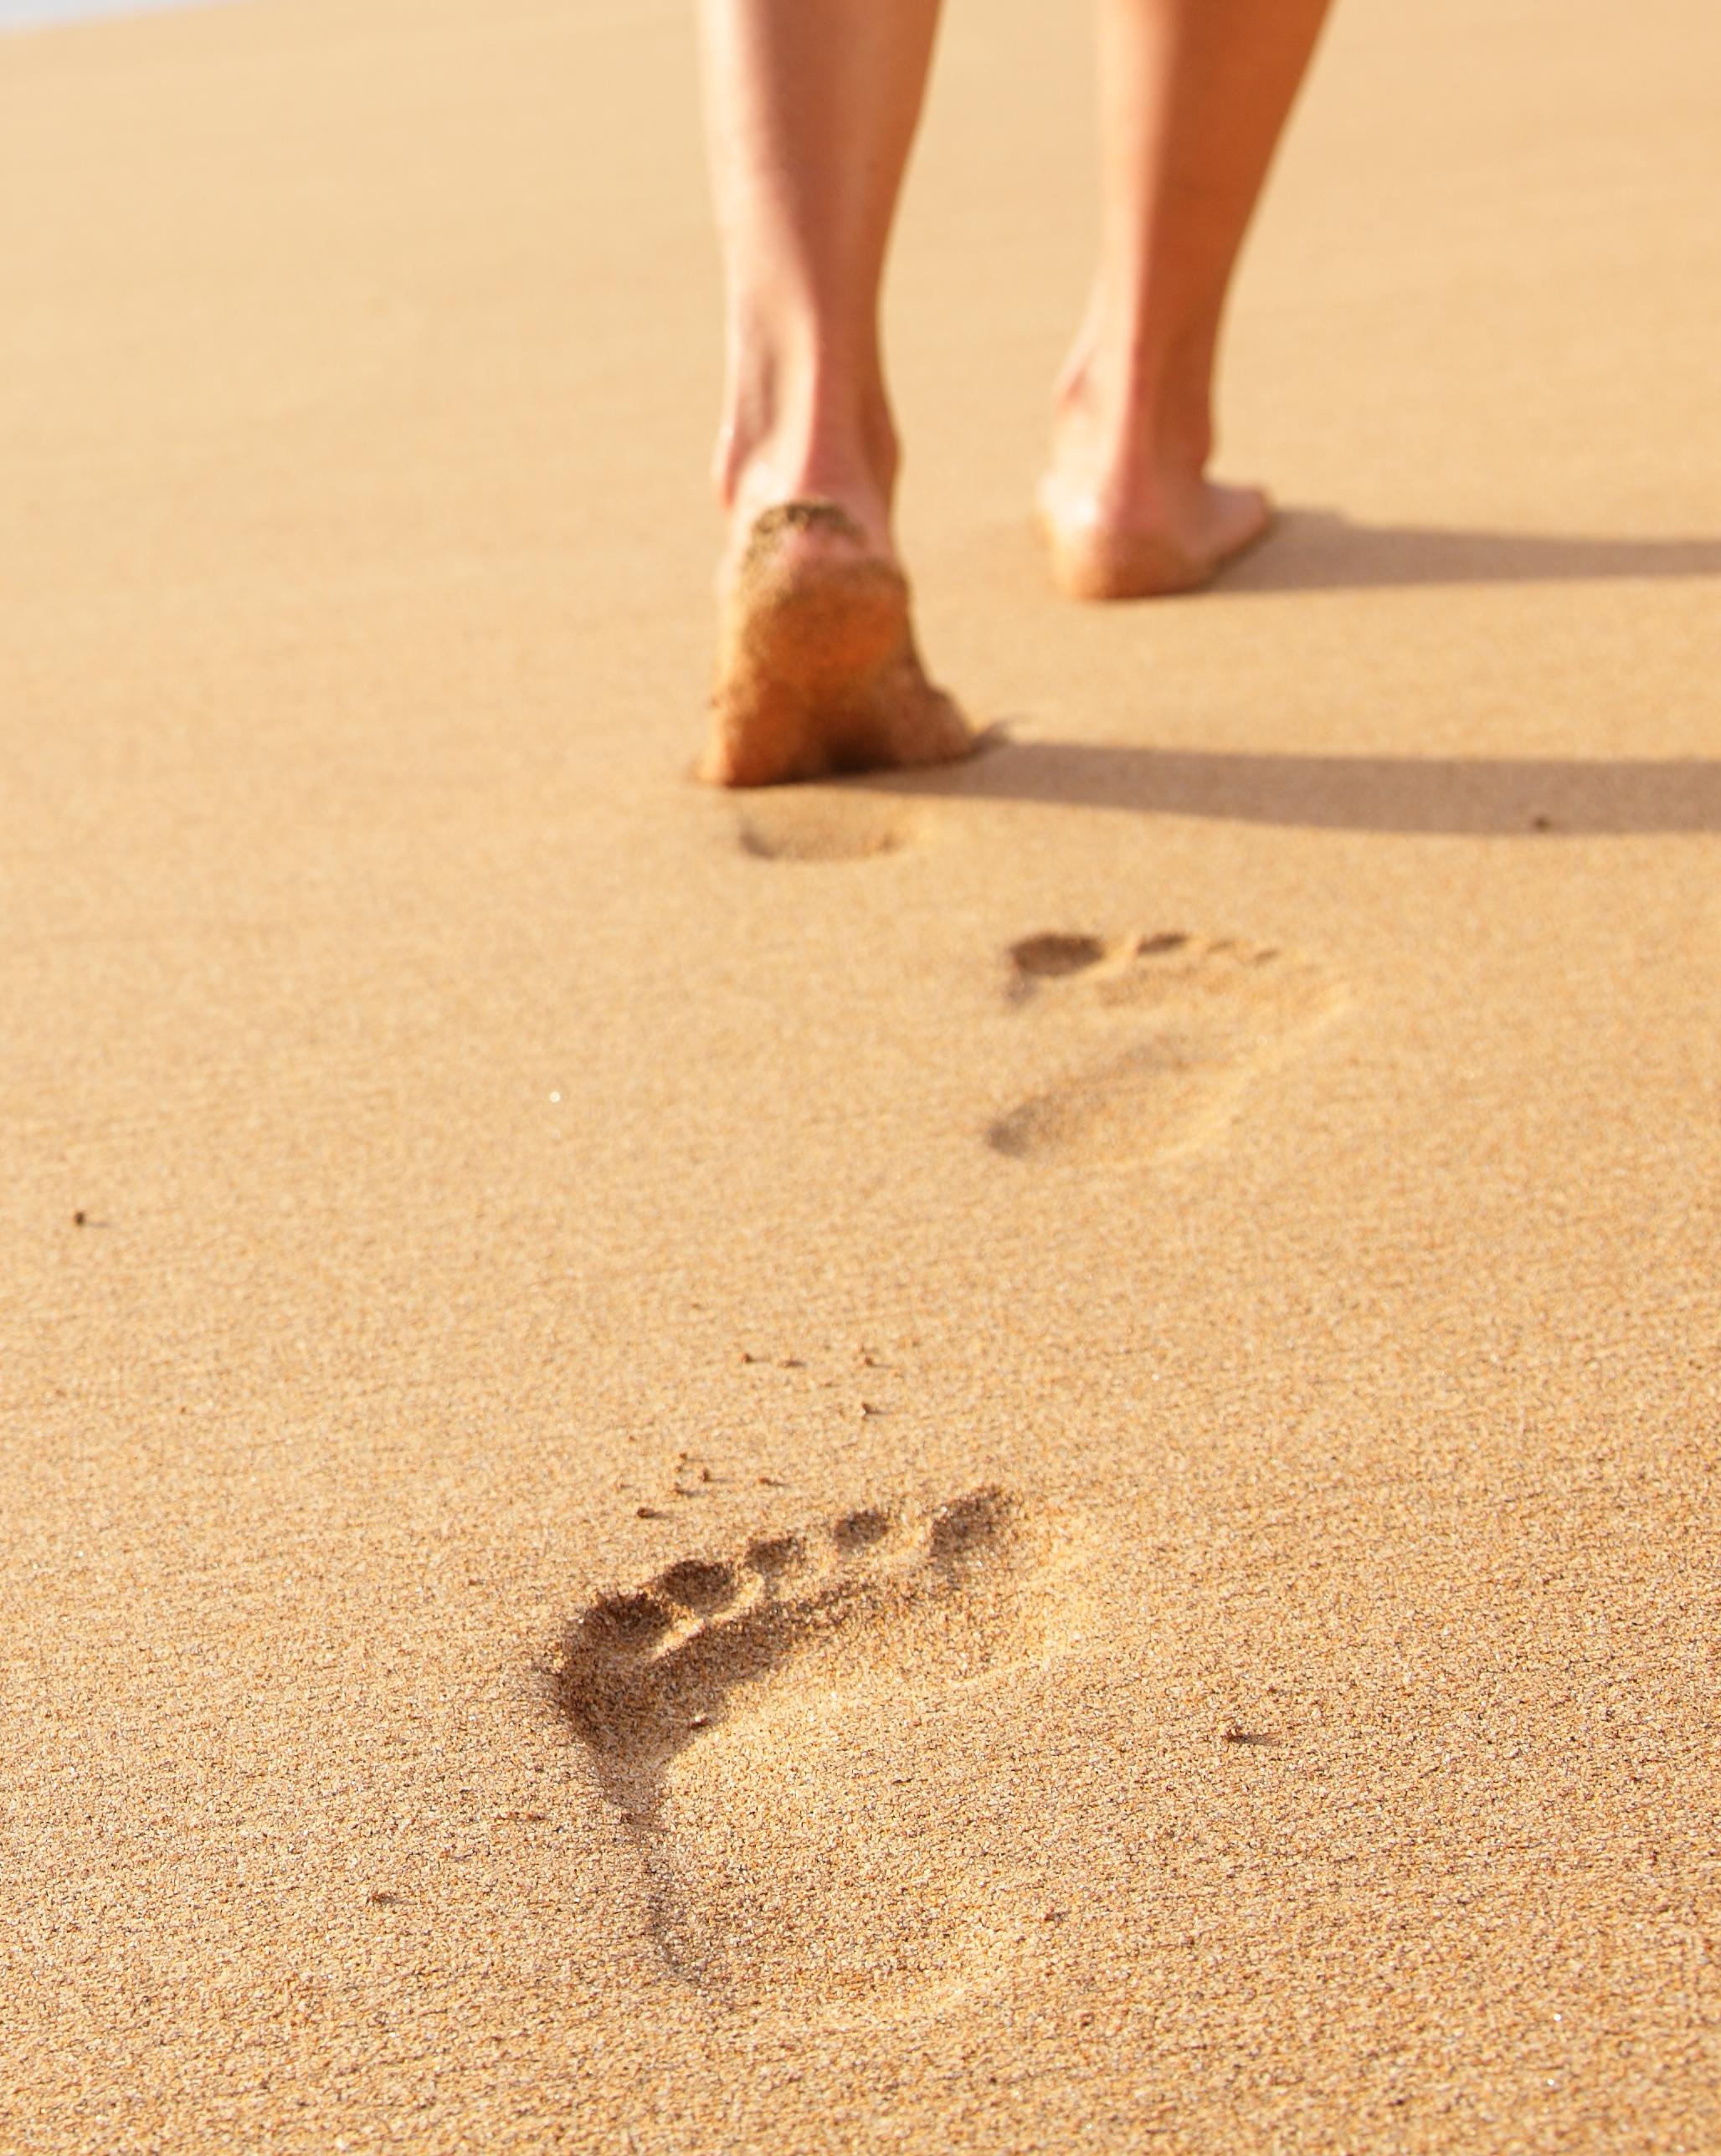 bigstock-Beach-travel--woman-walking-o-47037820-CROPPED.JPG